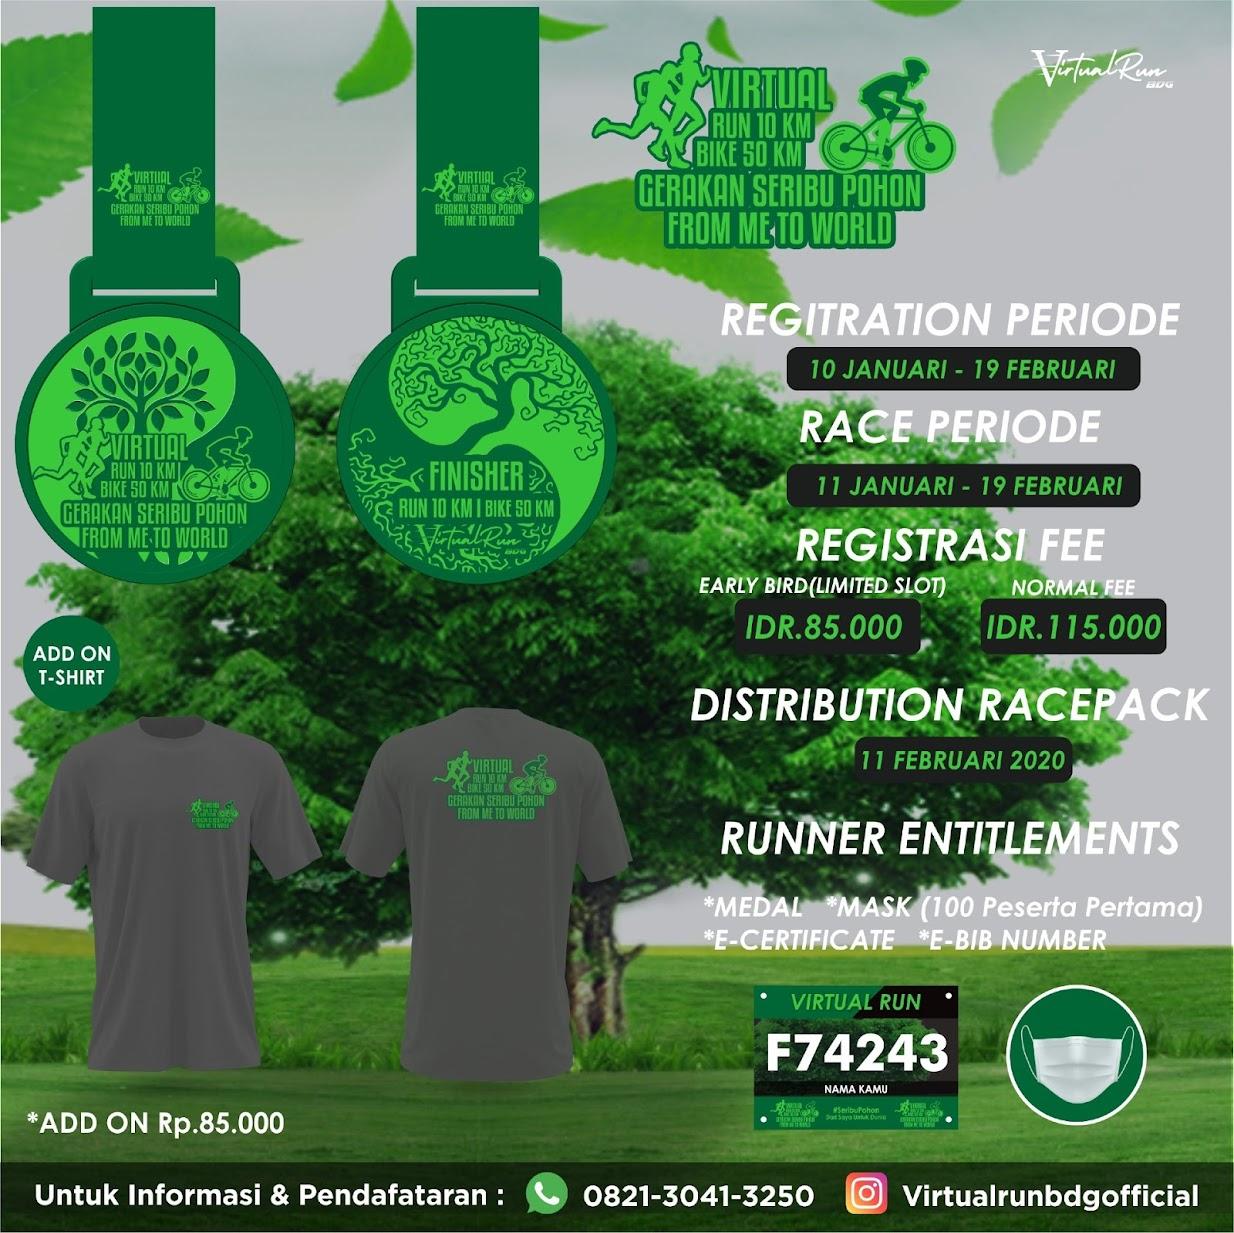 Virtual Run 10 Km & Bike 50 Km - Gerakan Seribu Pohon • 2021